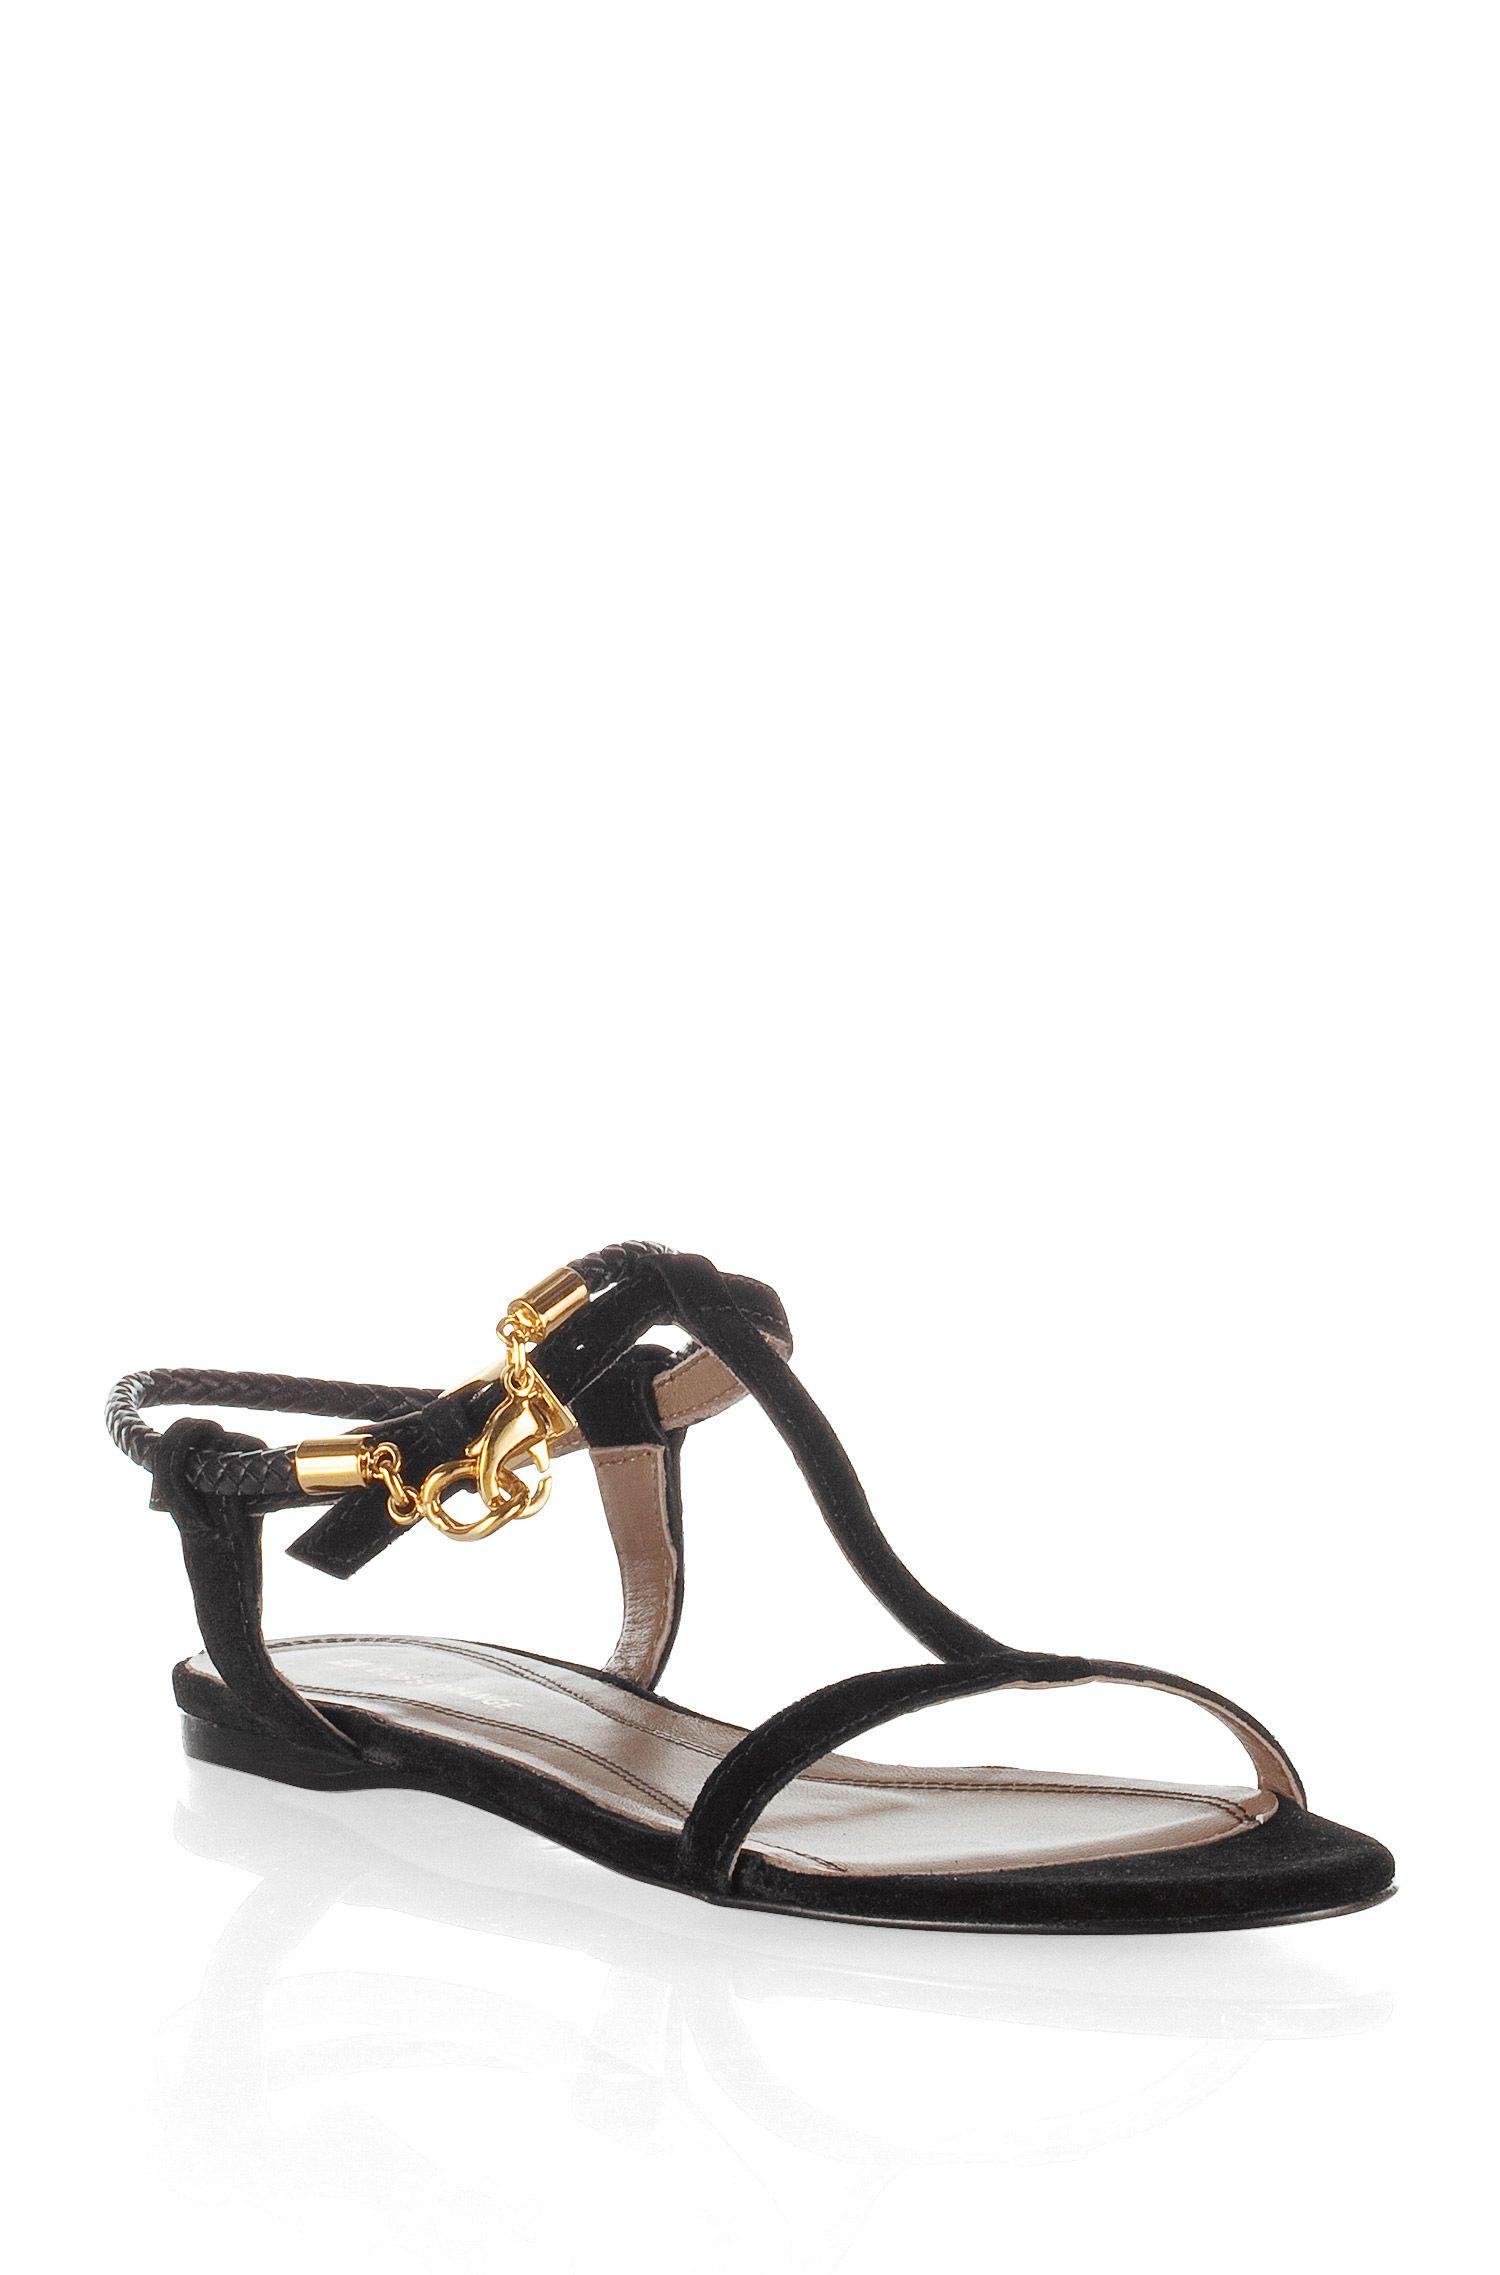 Sandales raffinées en daim souple, Lynet